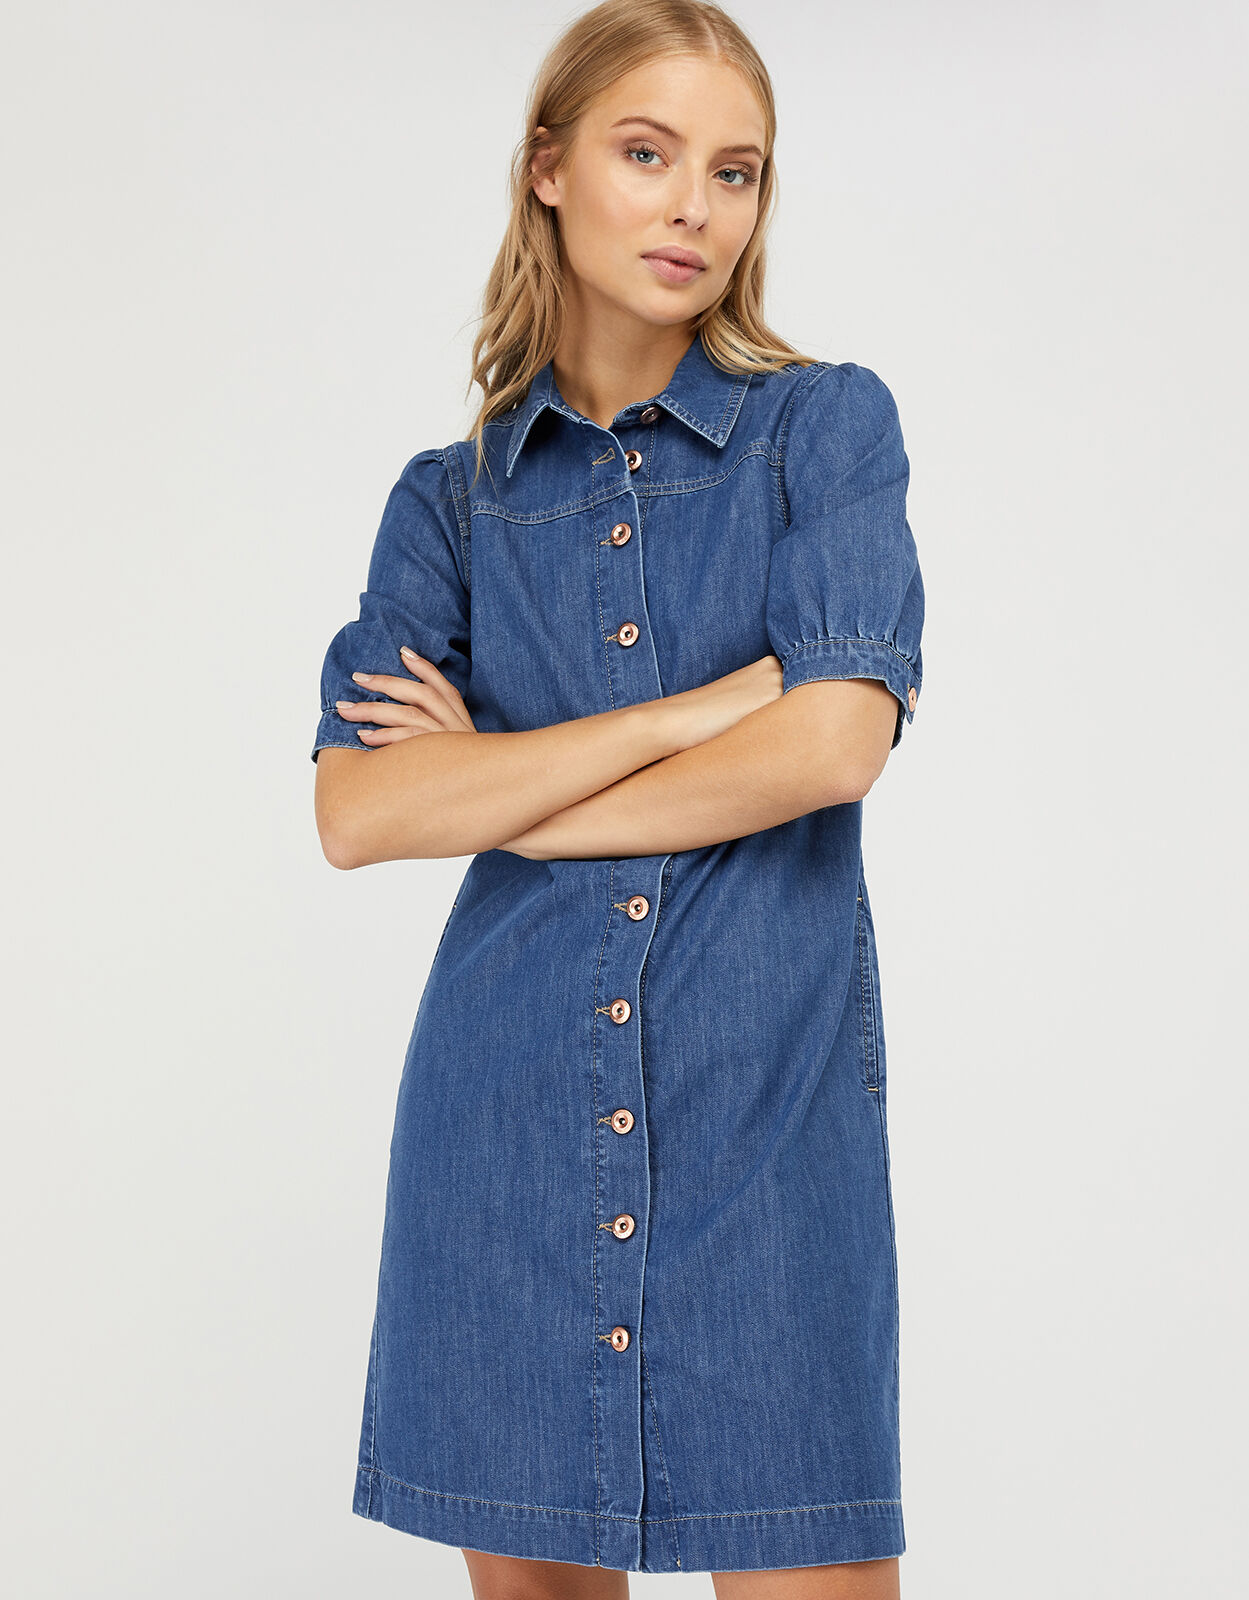 Denim Shirt Dress in Organic Cotton Blue | Casual & Day Dresses ...